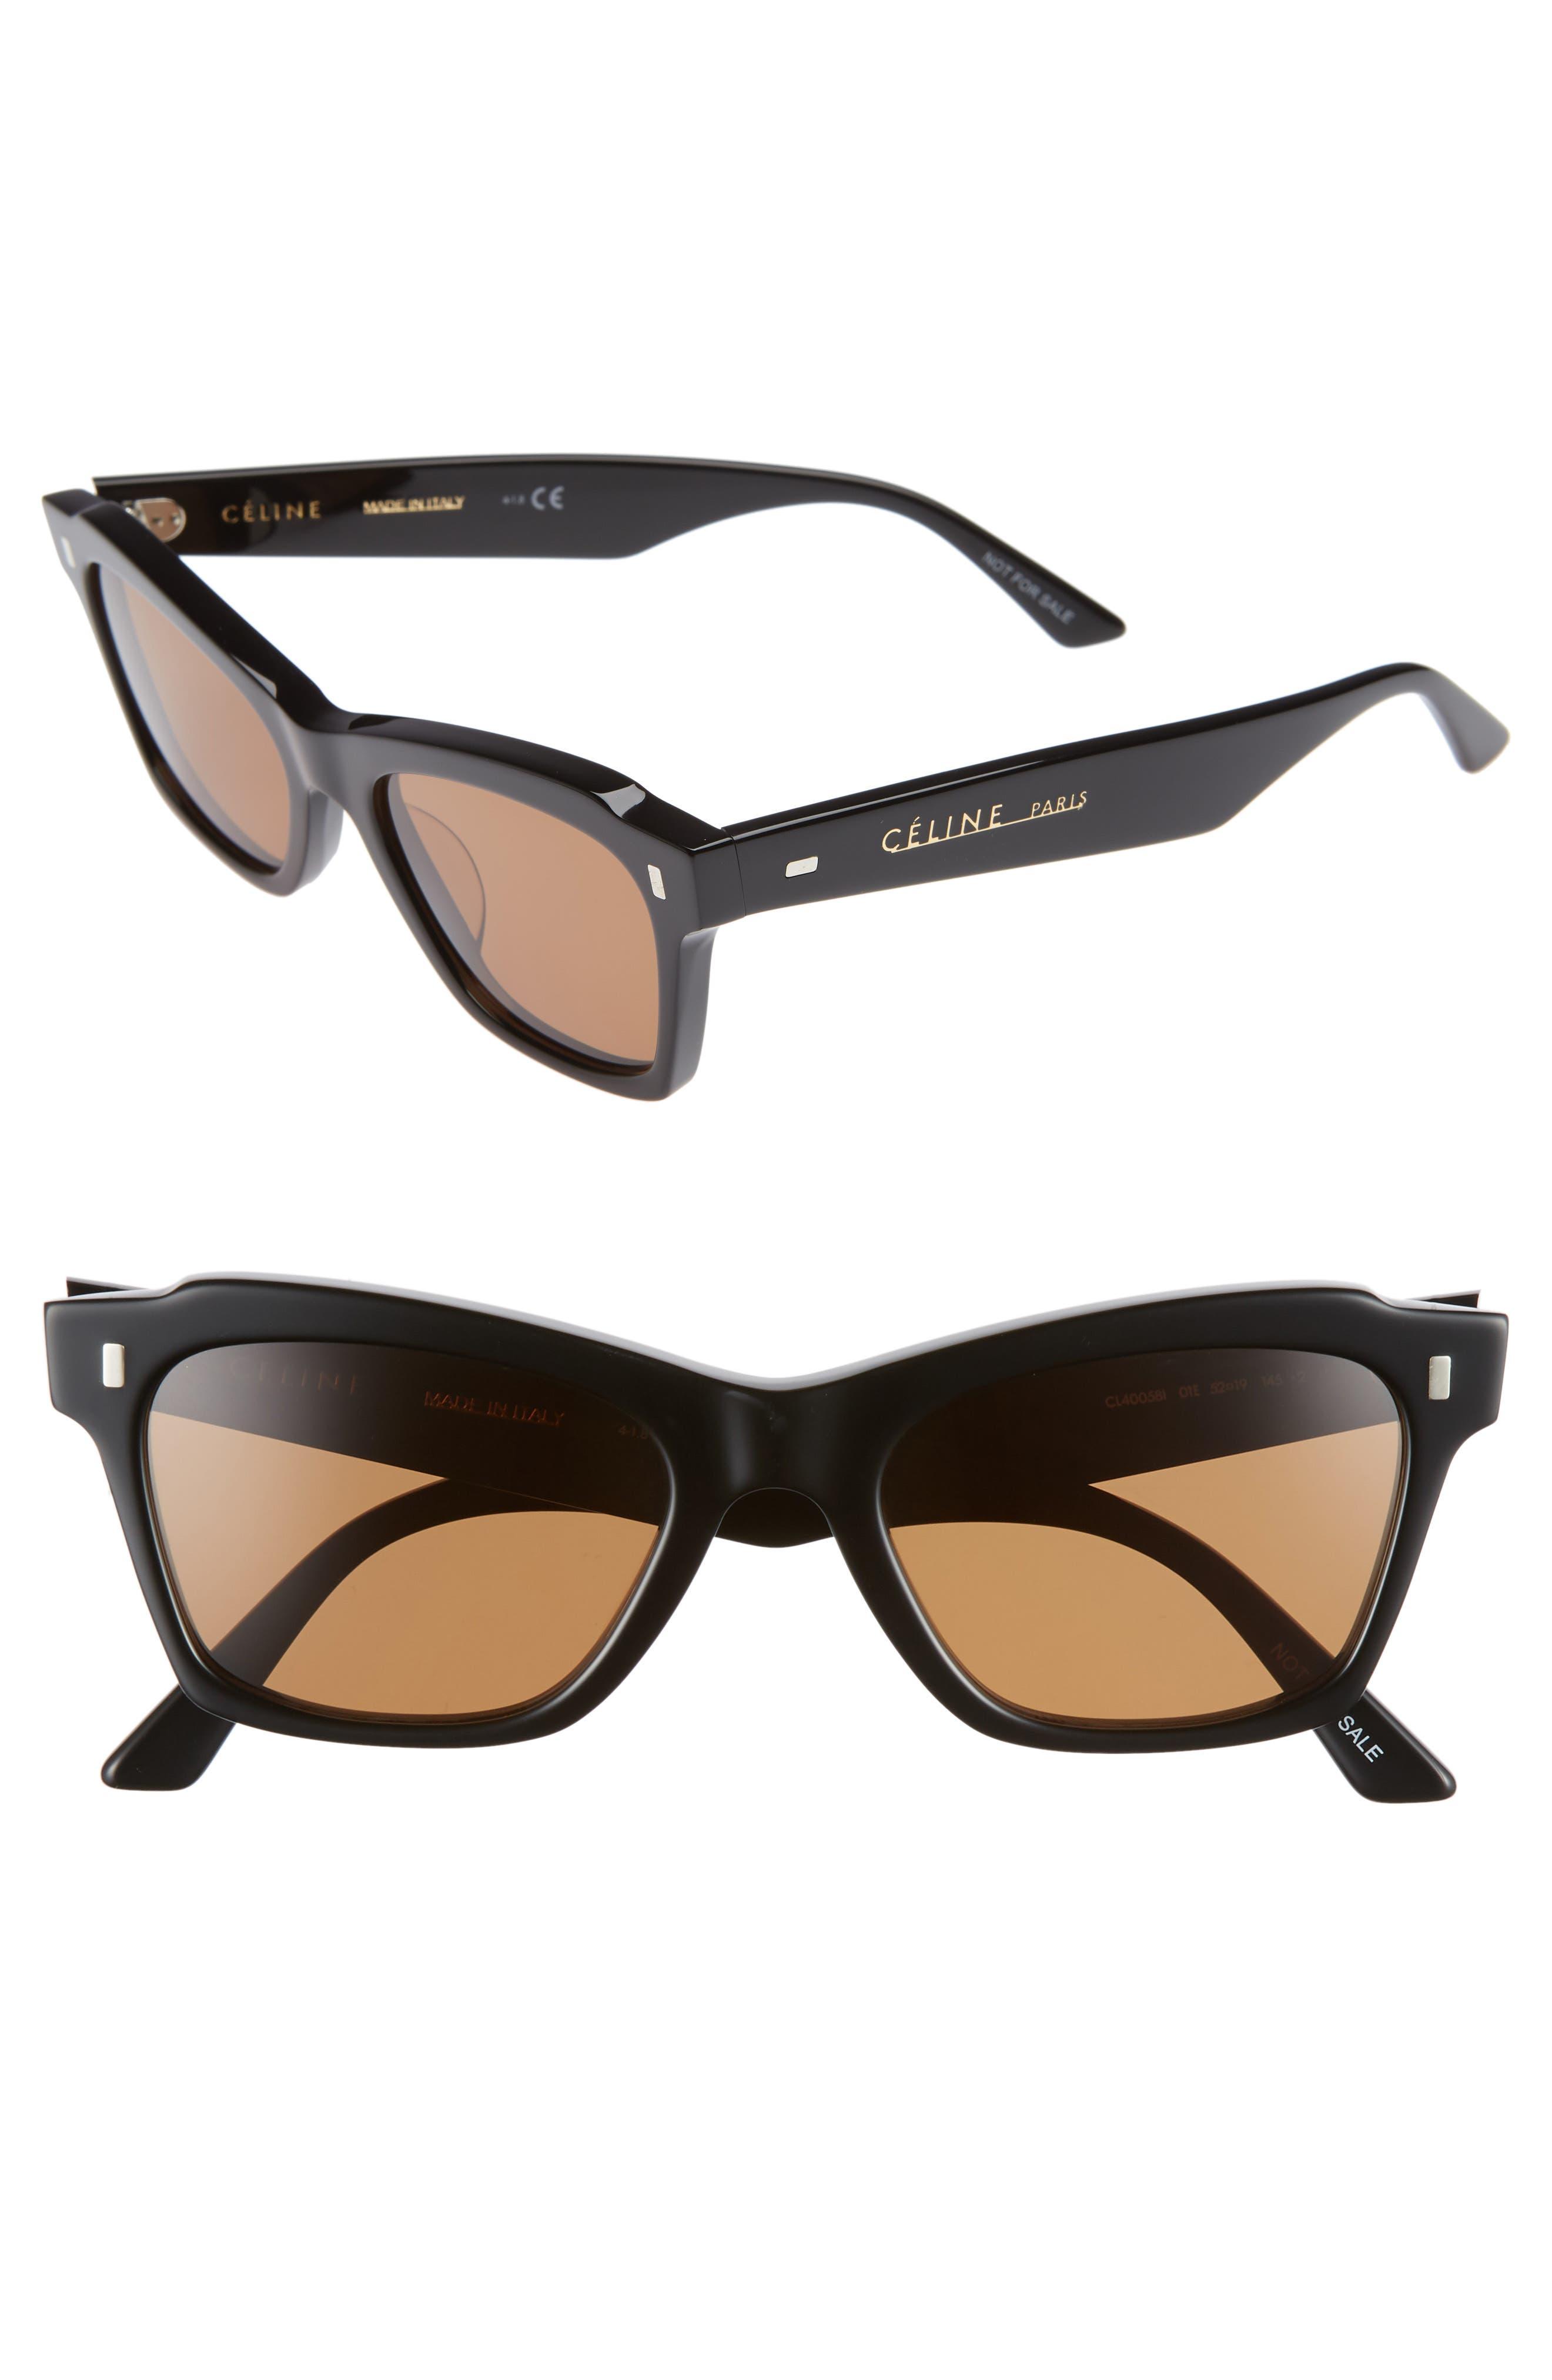 52mm Rectangle Cat Eye Sunglasses,                             Main thumbnail 1, color,                             BLACK